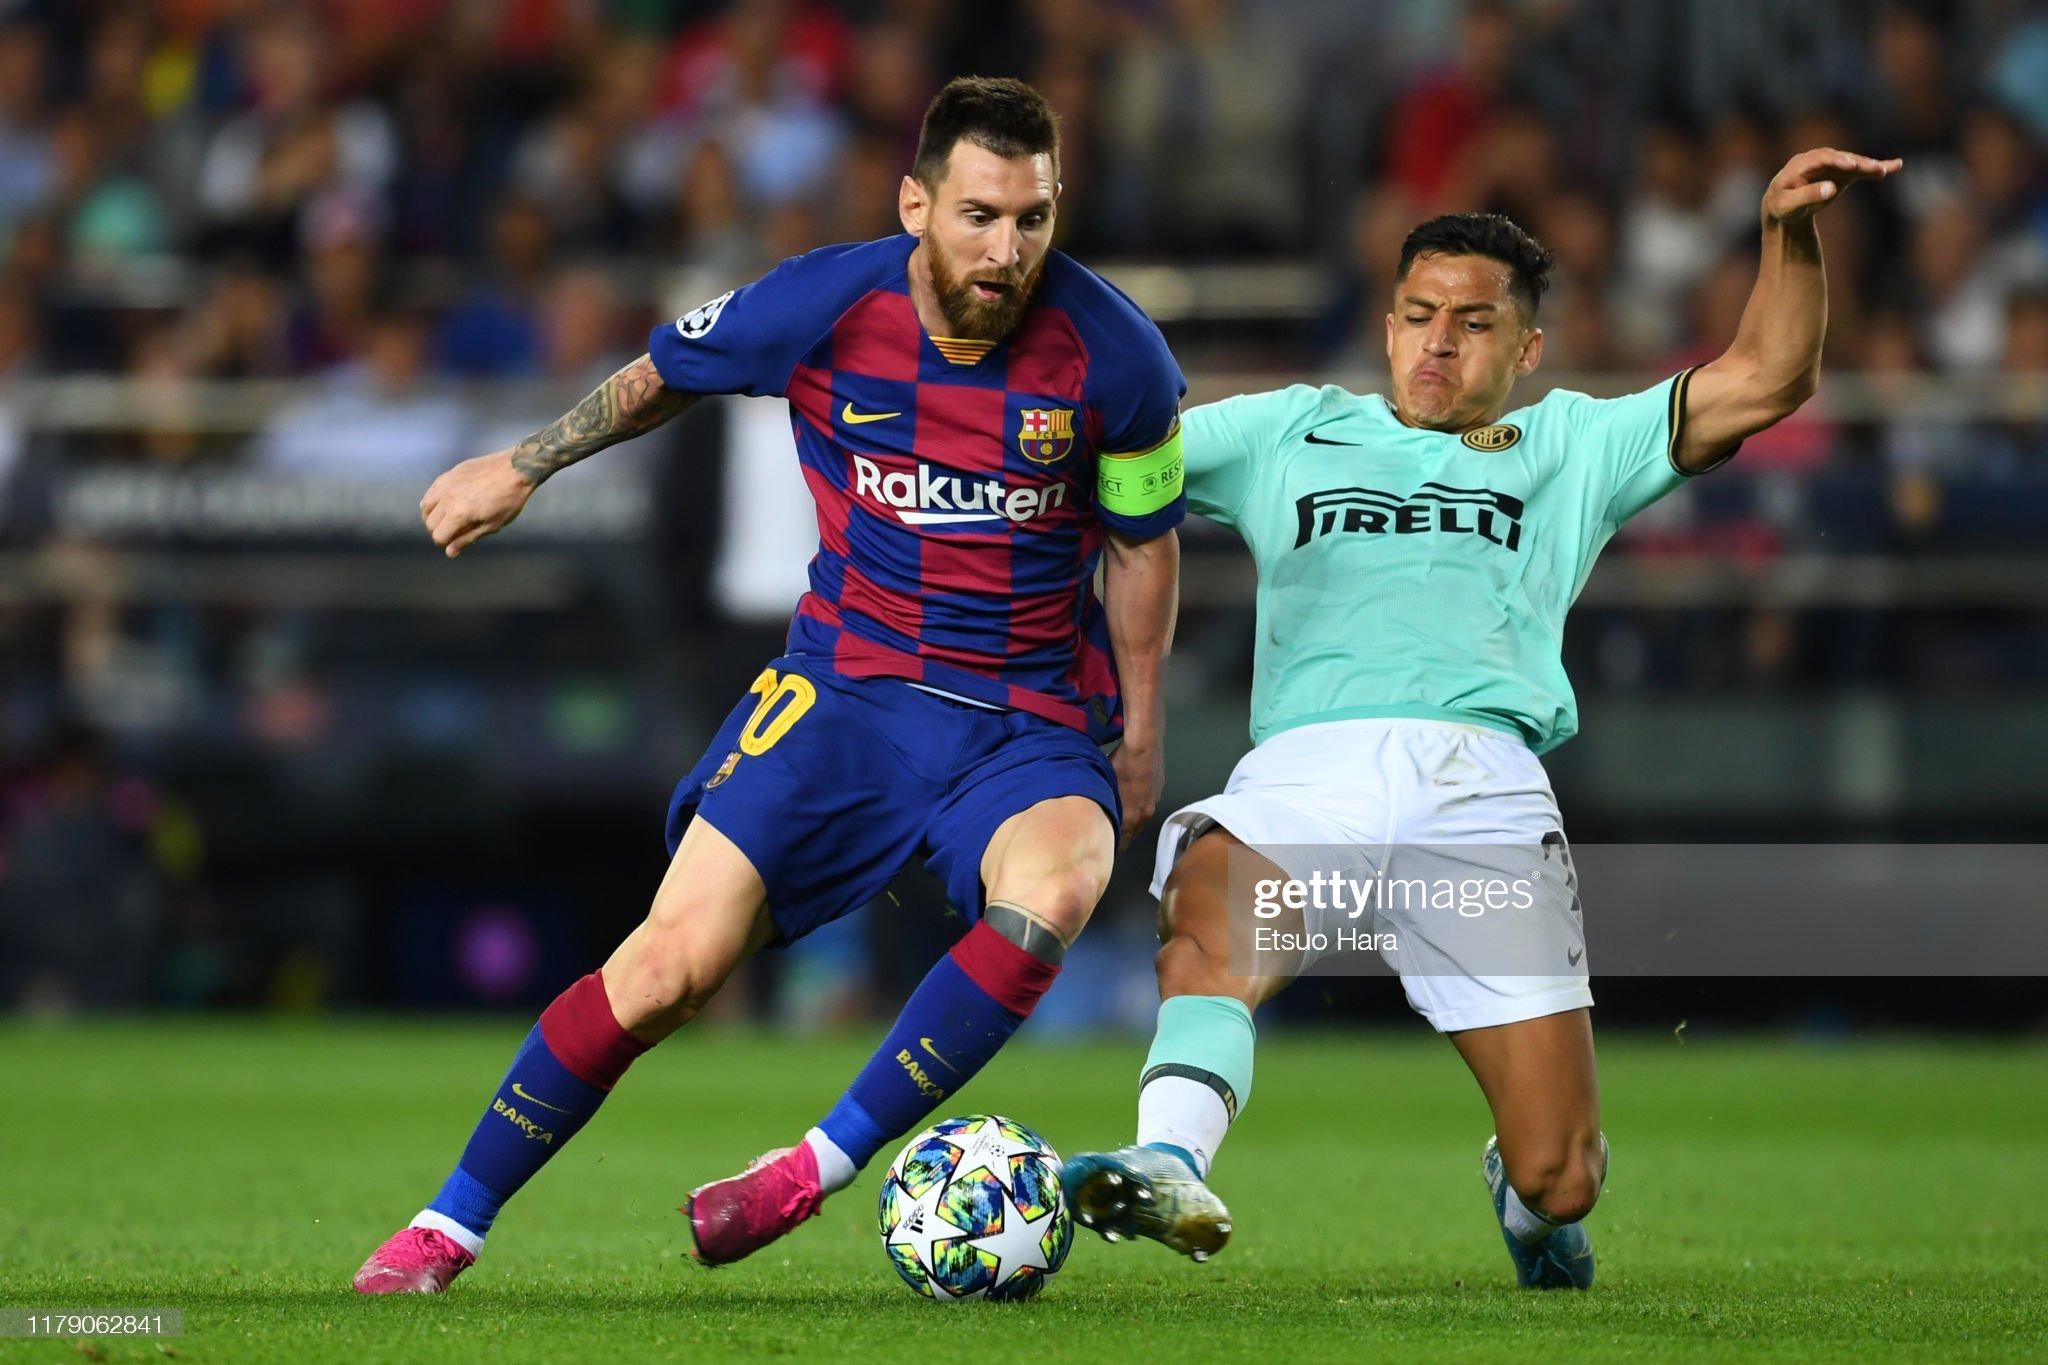 صور مباراة : برشلونة - إنتر 2-1 ( 02-10-2019 )  Lionel-messi-of-fc-barcelona-and-alexis-sanchez-of-inter-compete-for-picture-id1179062841?s=2048x2048